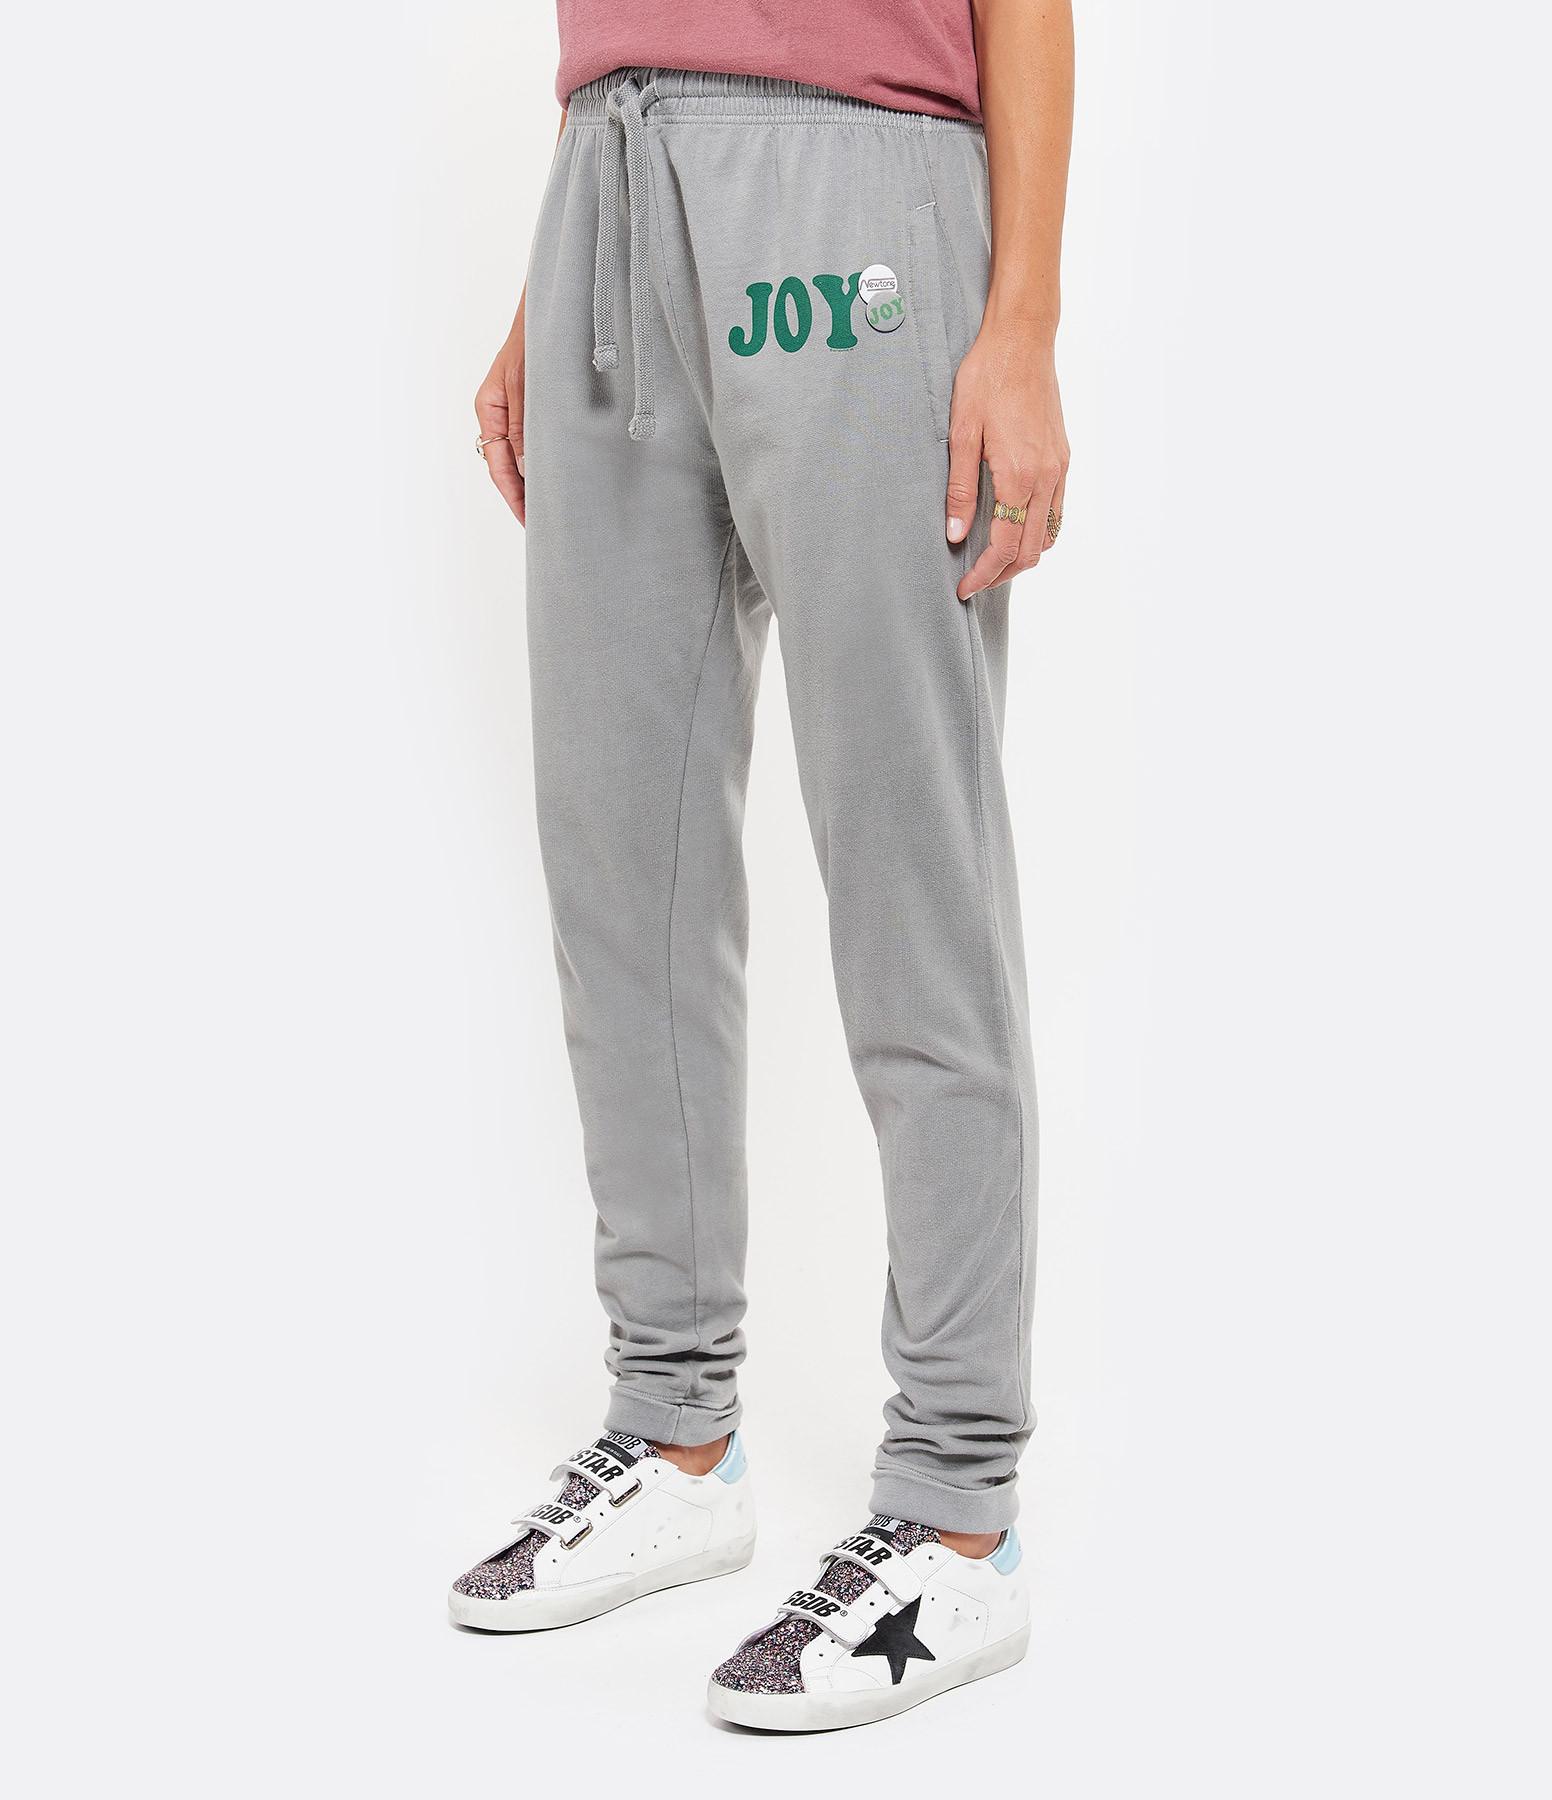 NEWTONE - Jogging Joy Coton Gris